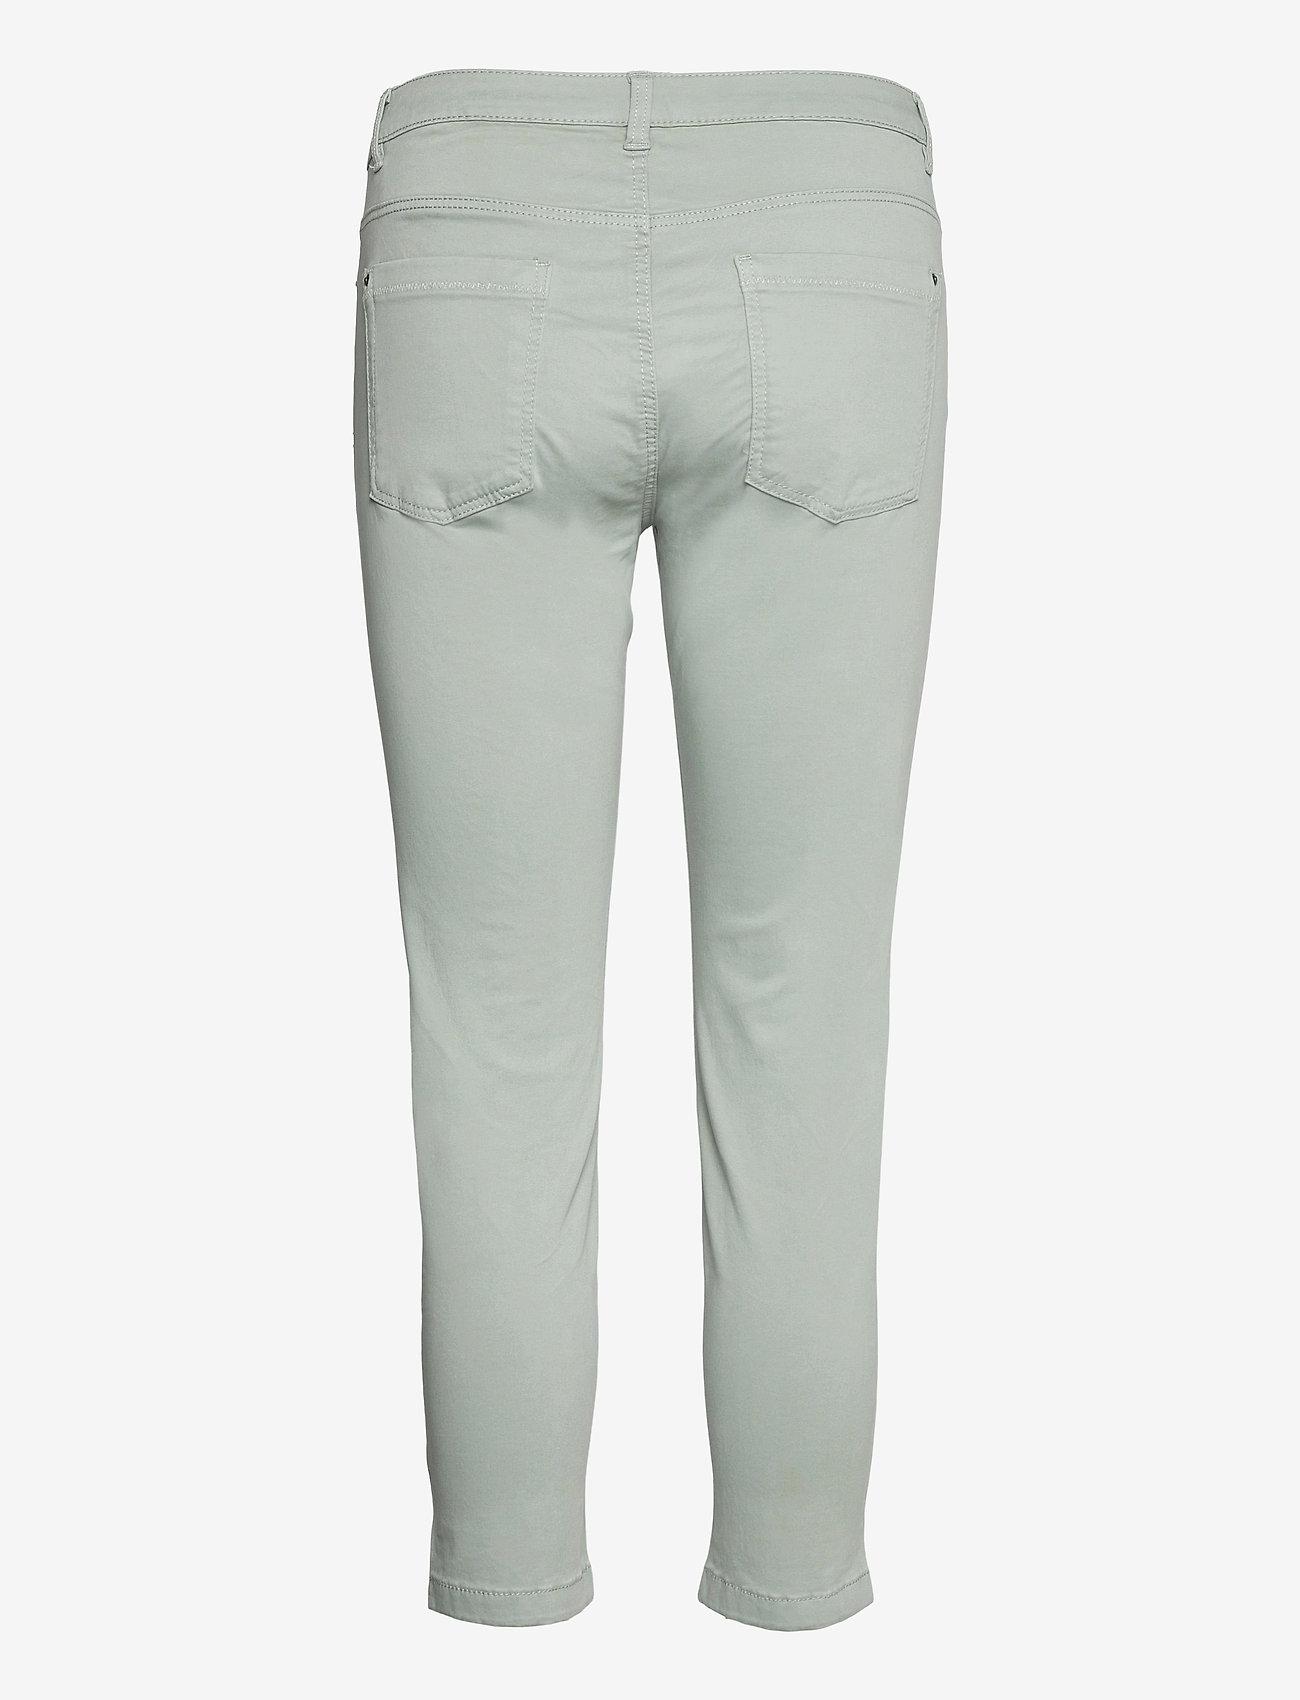 Esprit Casual - Pants woven - slim fit bukser - light khaki - 1